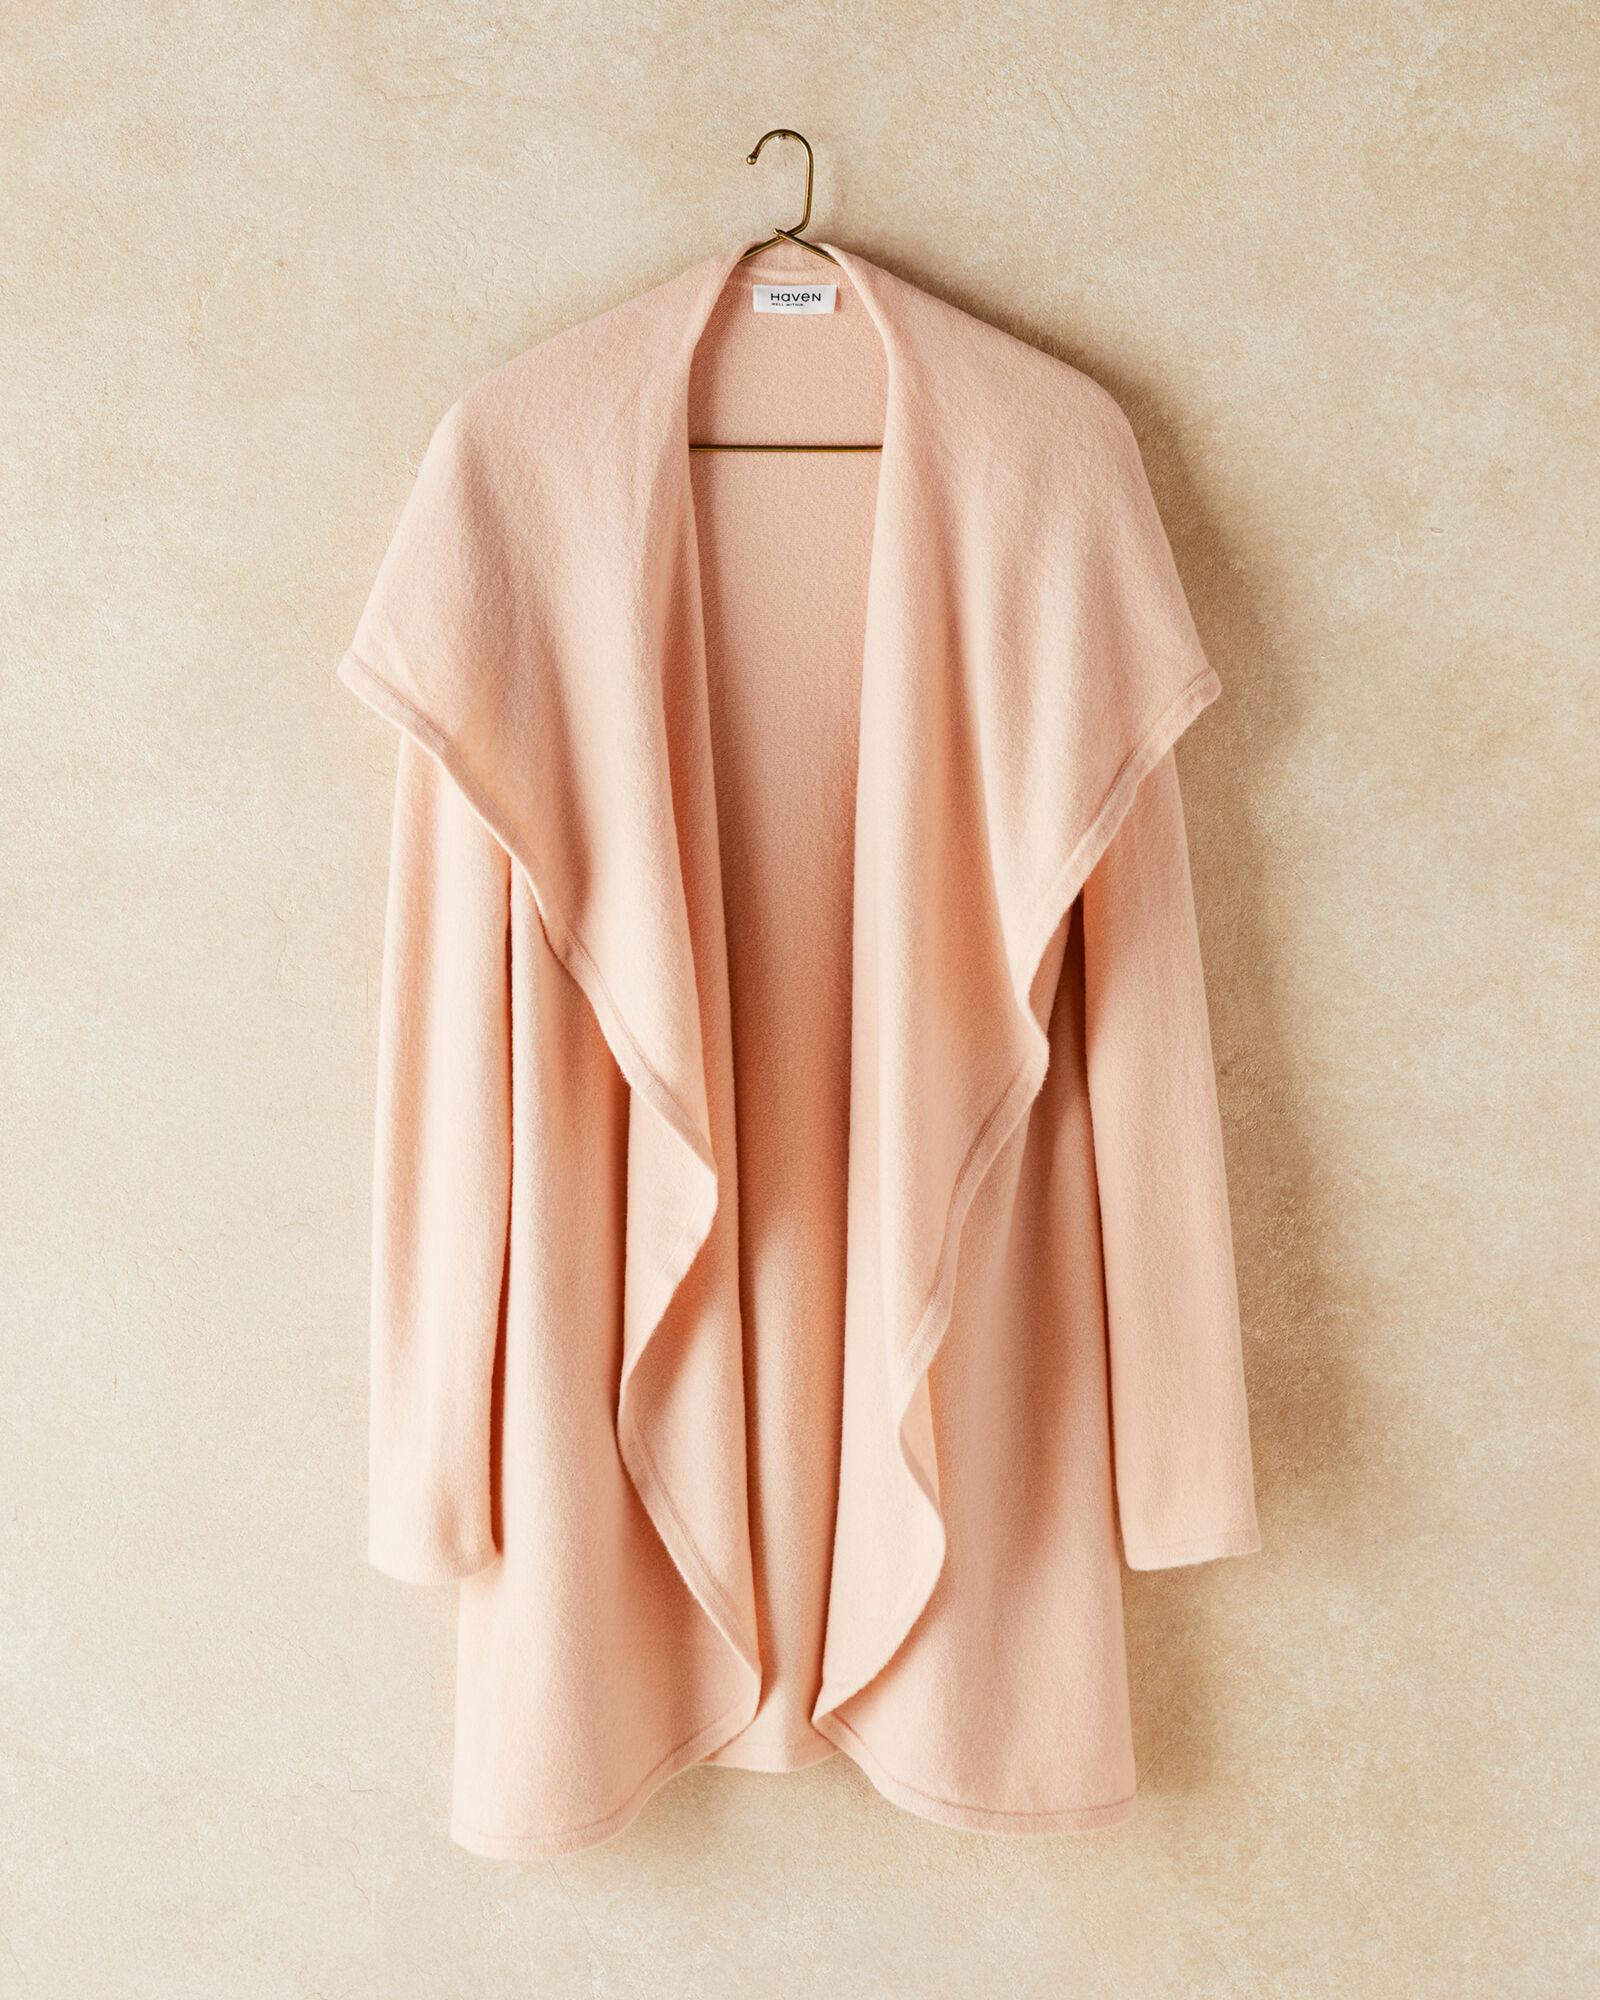 Talbots Oversized Shawl Cardigan Sweater - Blush - Medium Talbots  - Blush - Size: female - Size: Medium